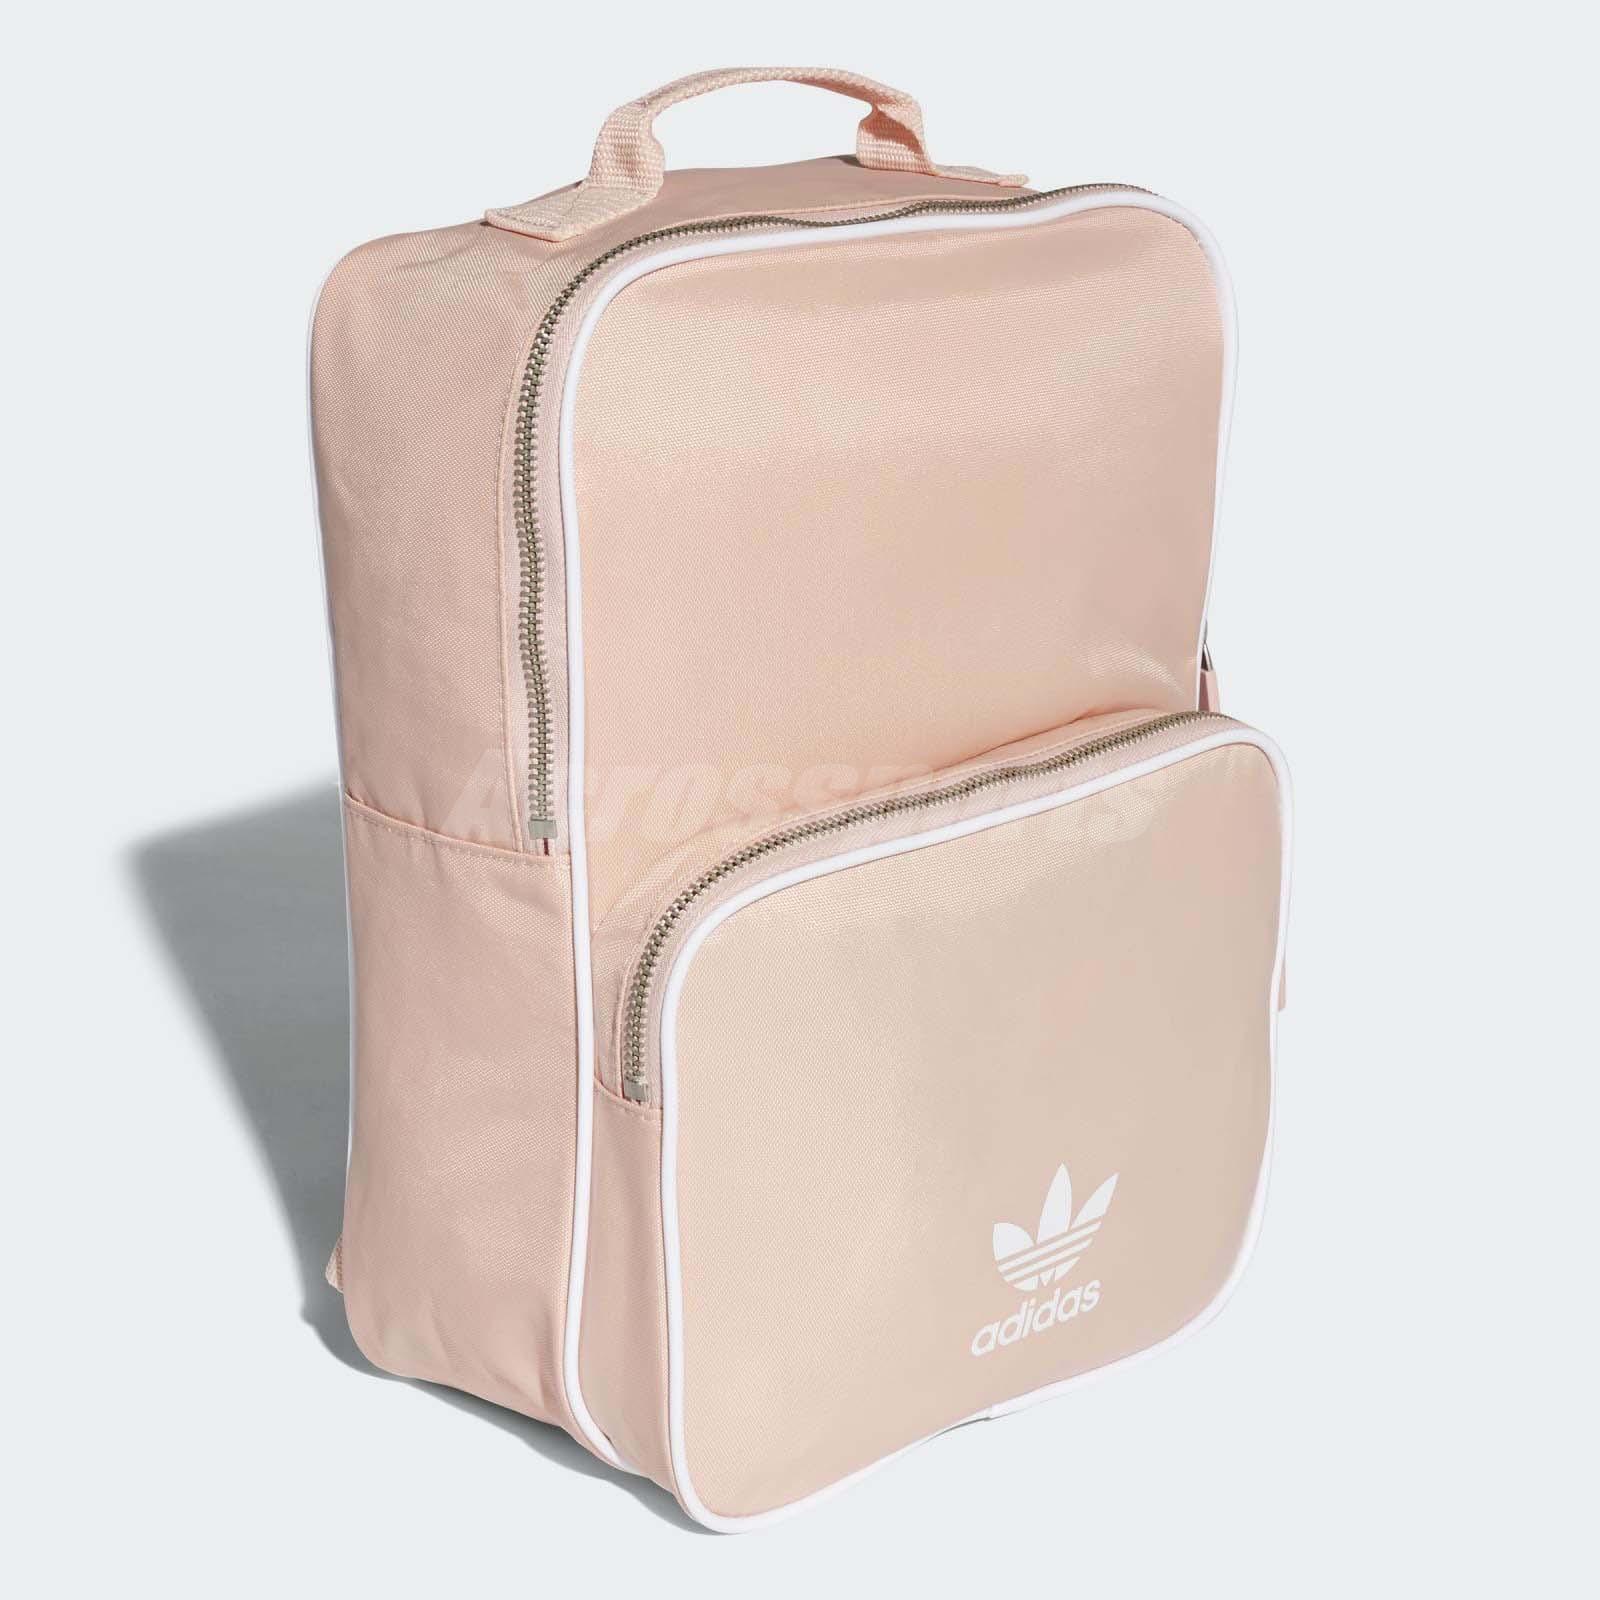 71e0b7fbaf adidas Originals Classic Backpack Pink White Trefoil Sports Bag ...